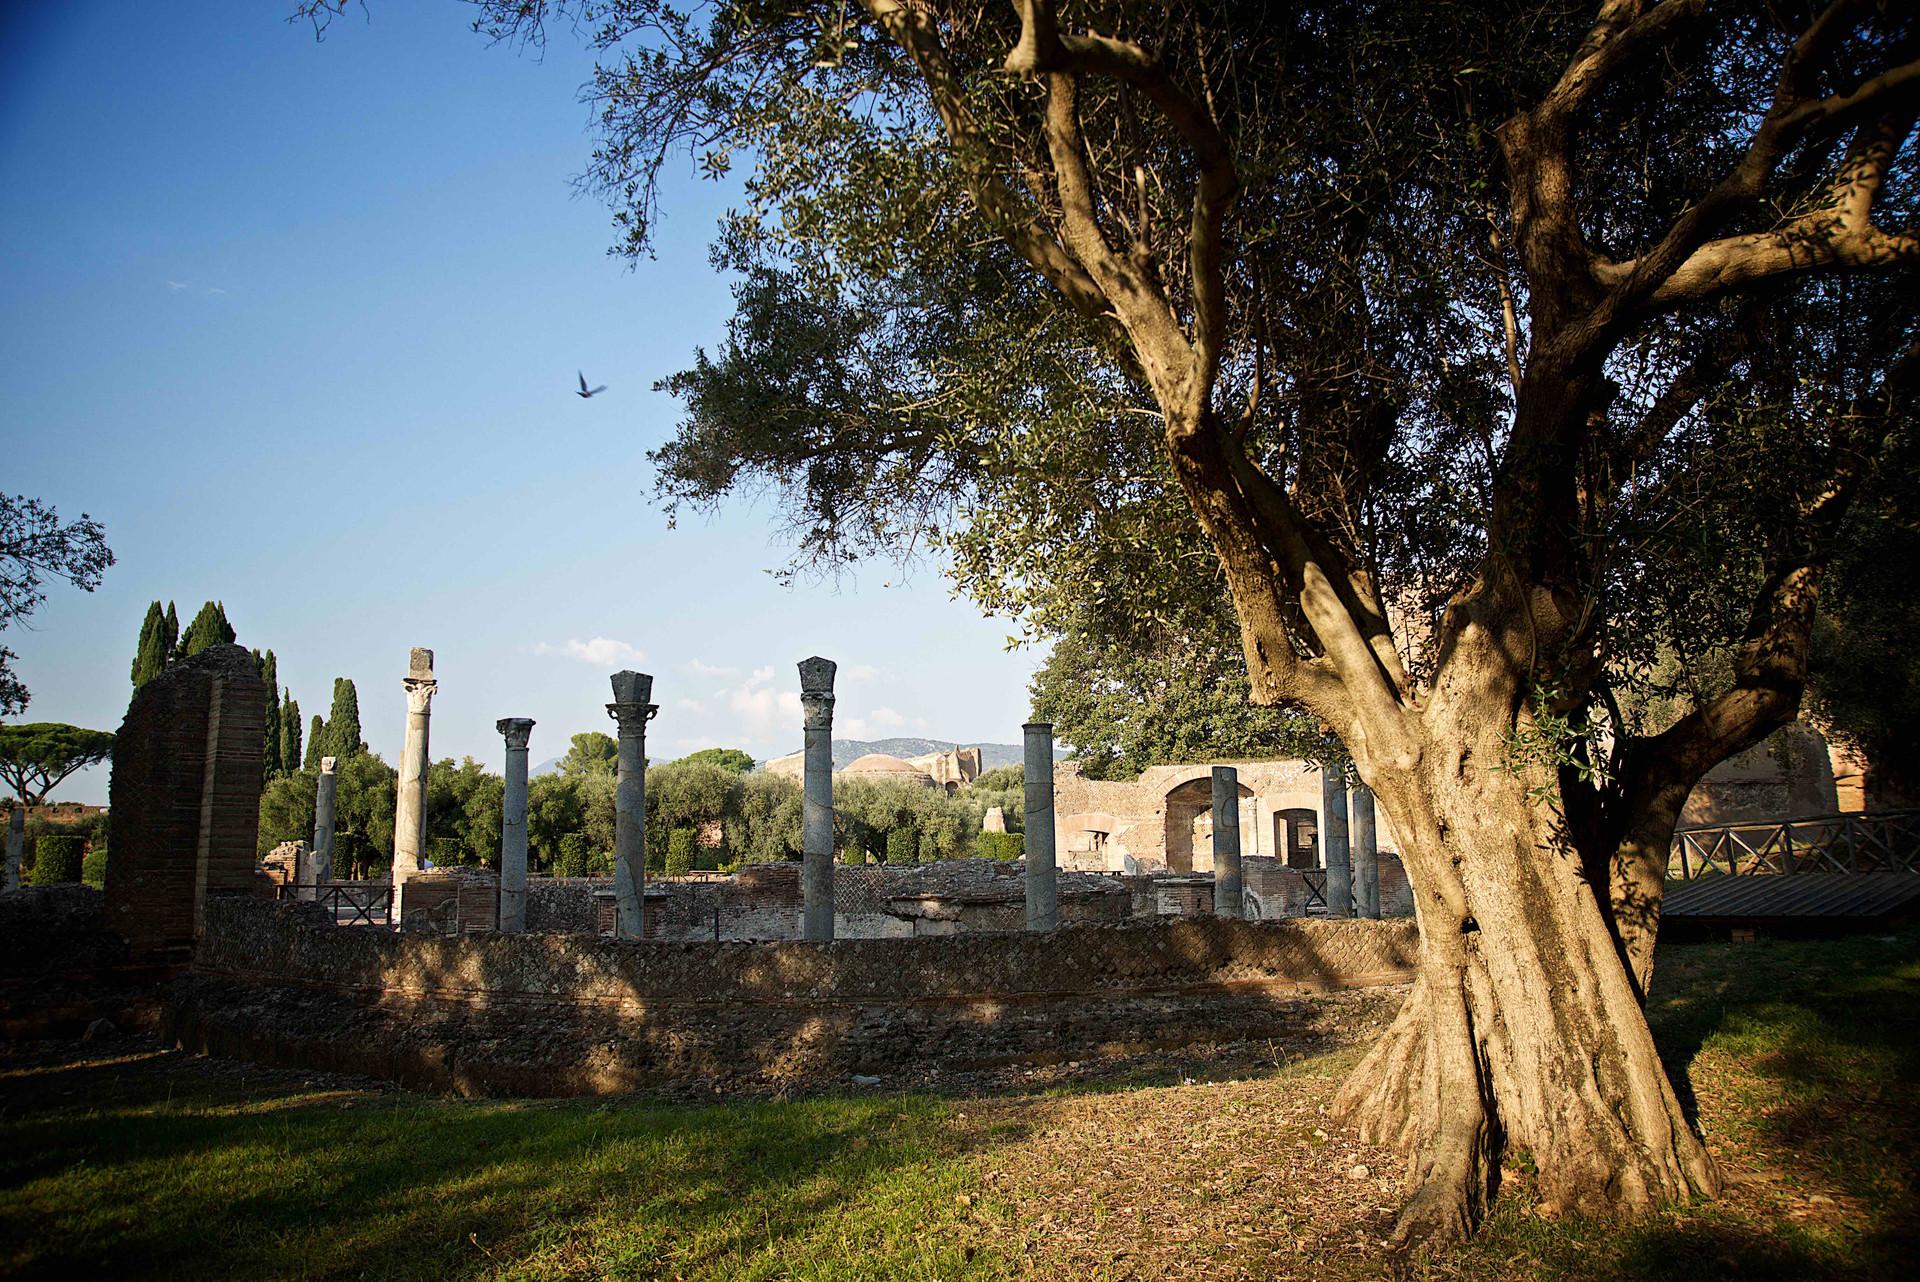 Villa Adriana, Ruins and Olive Tree